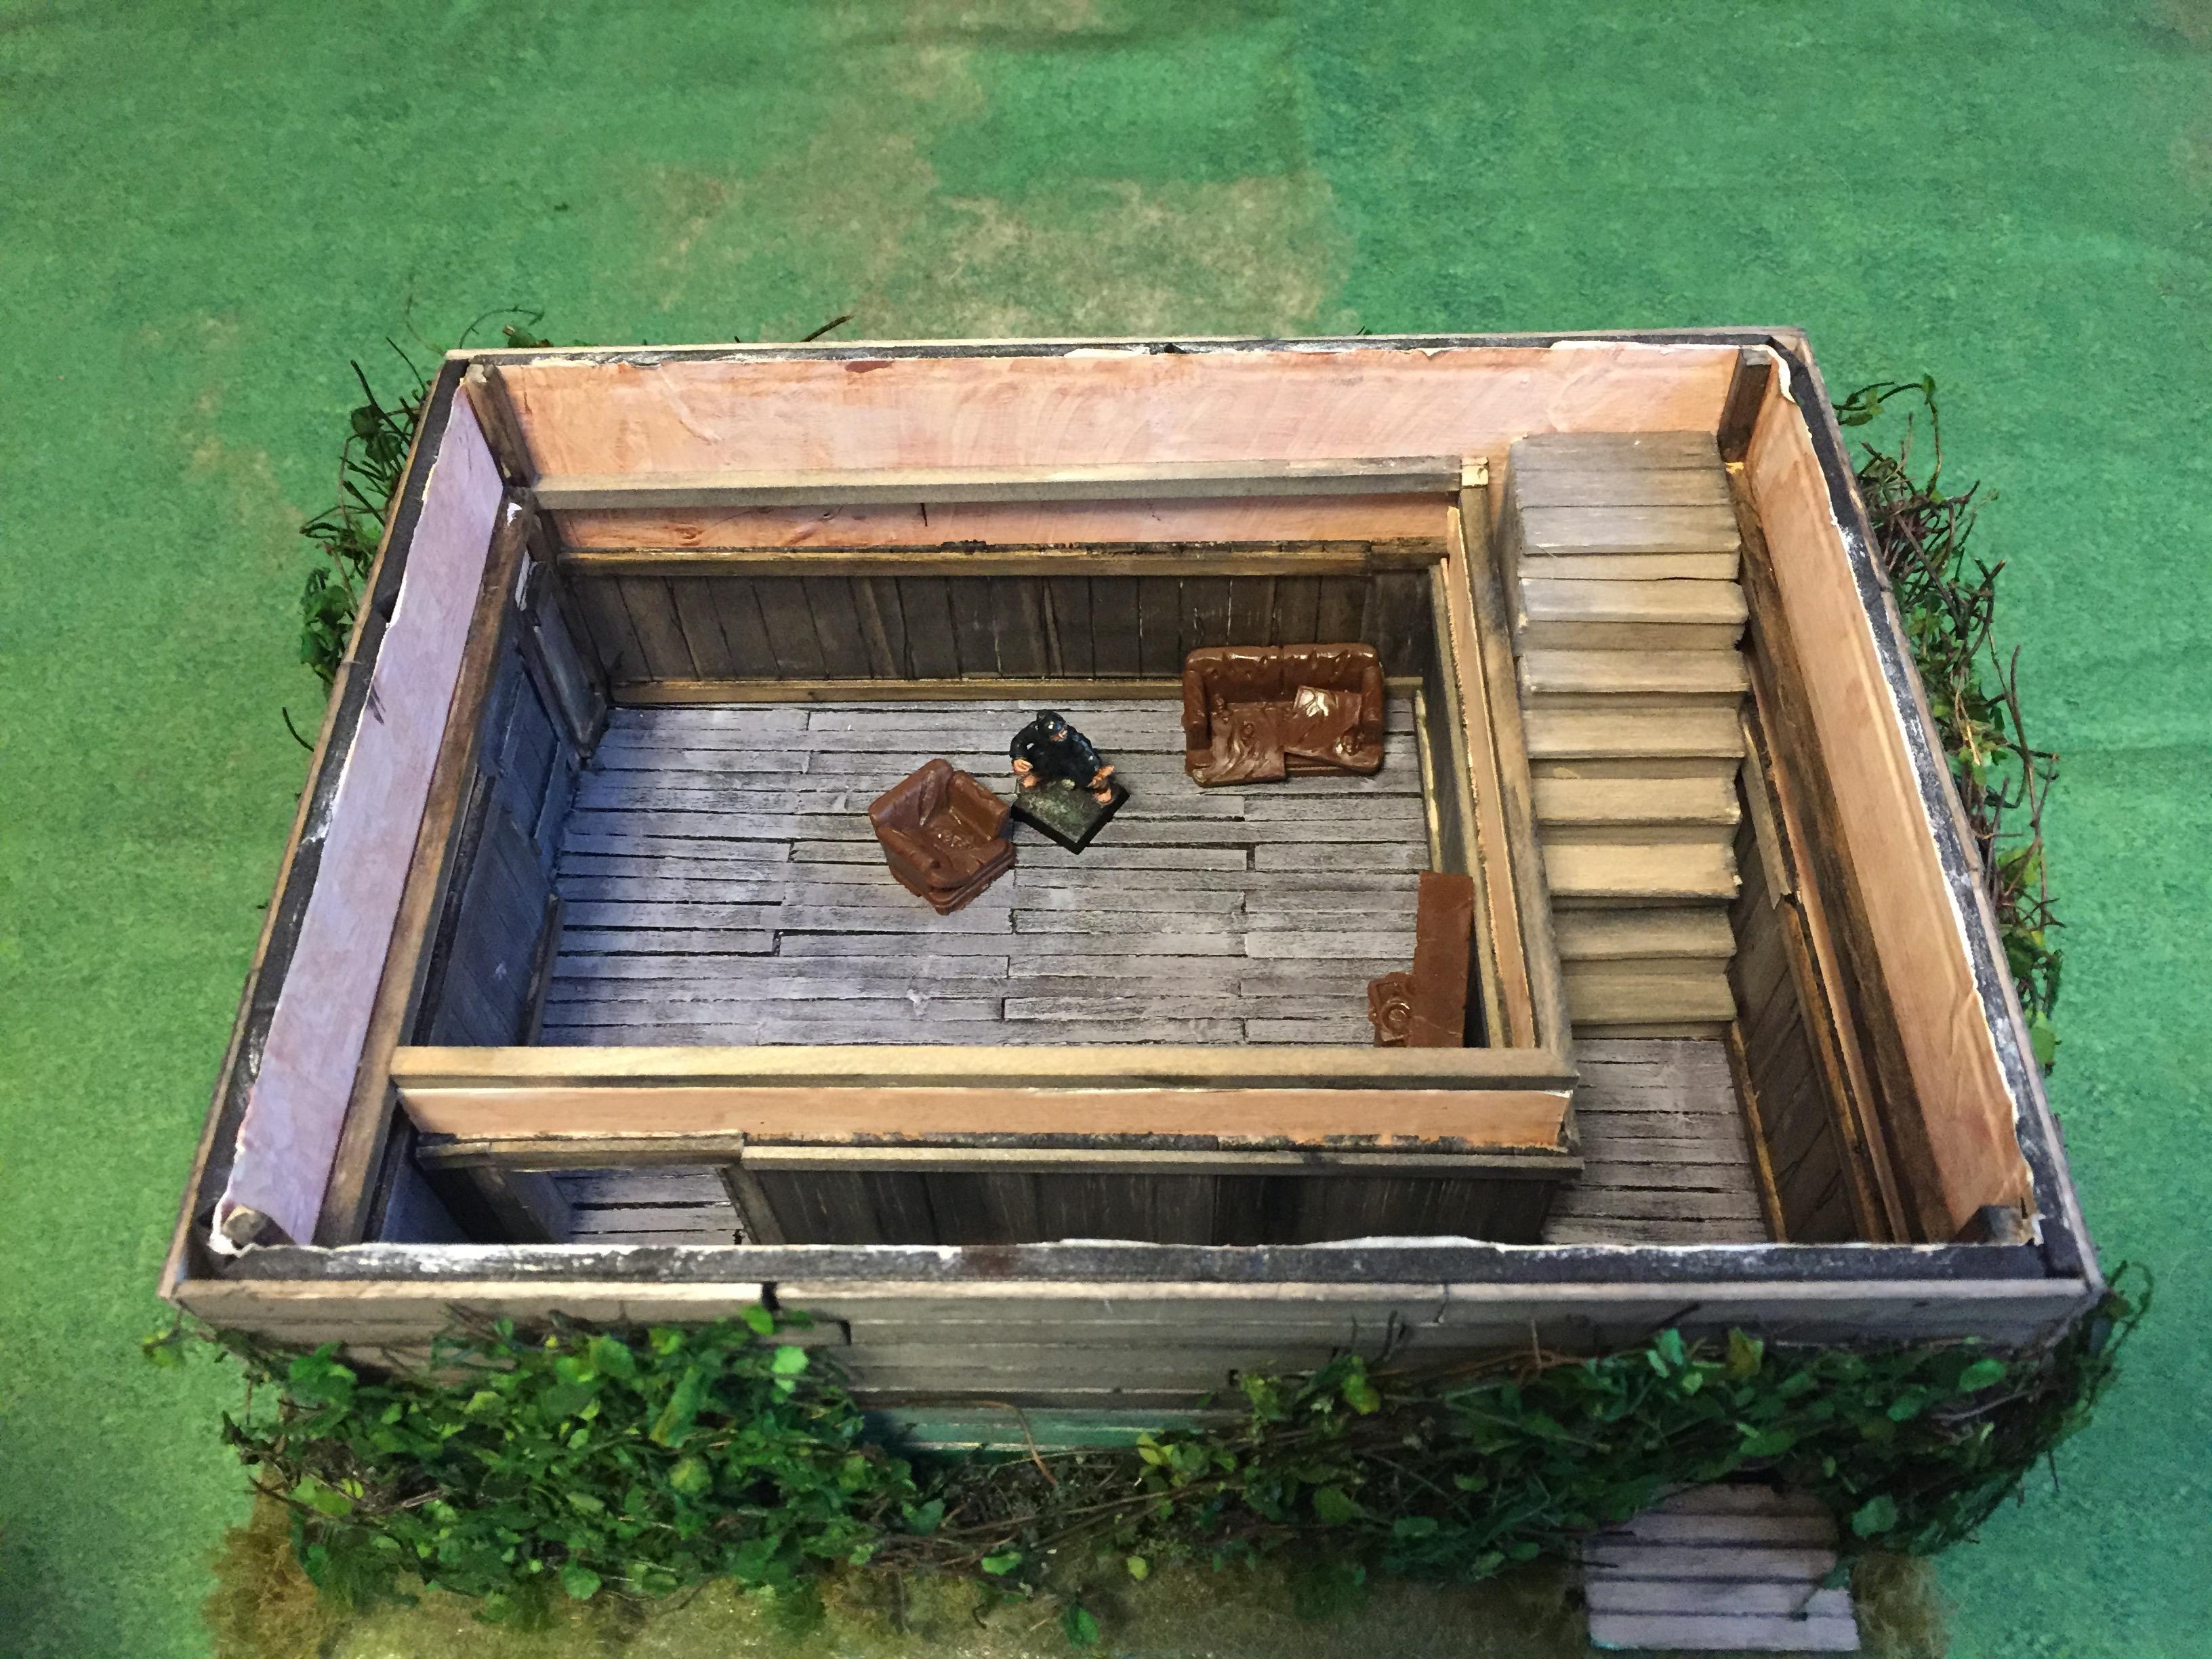 Cannibal, House, May 2021, Scrathbuilt, Terrain